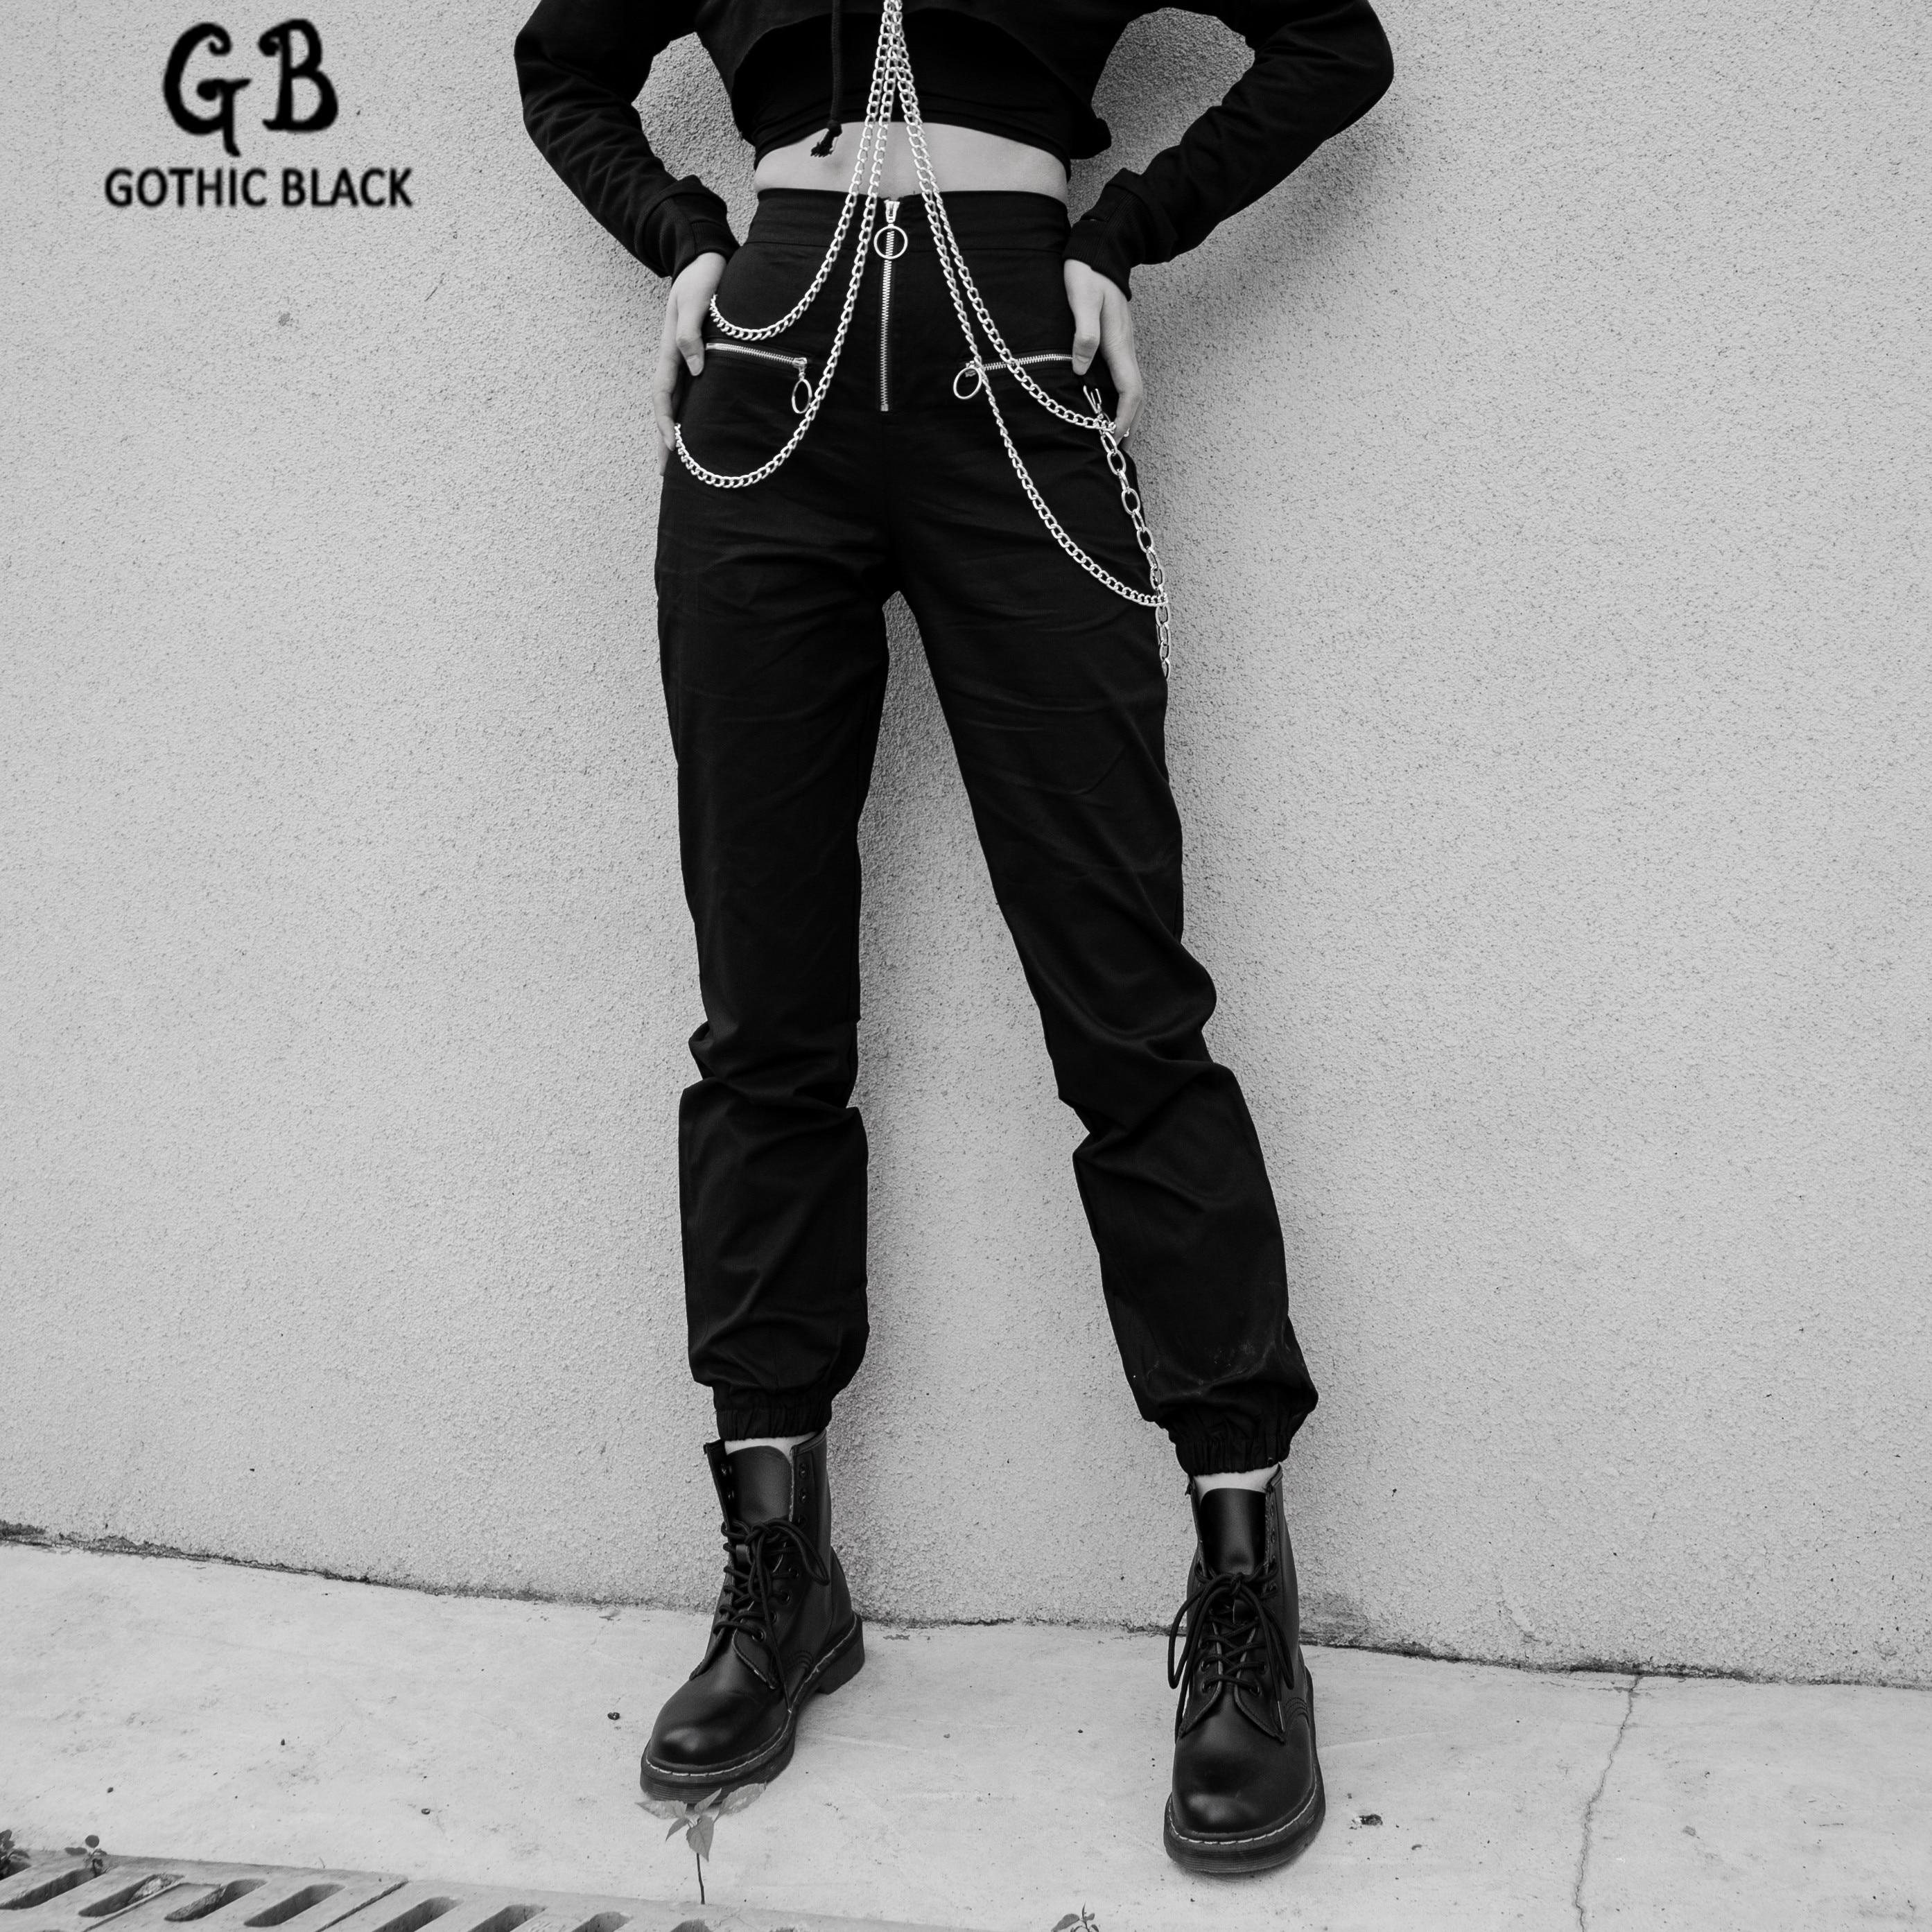 Gothic Black Women Slim Pocket Chain Zipper Harem Pants 2019 Winter Goth Punk Streetwear Female Solid Color Loose Harem Pants